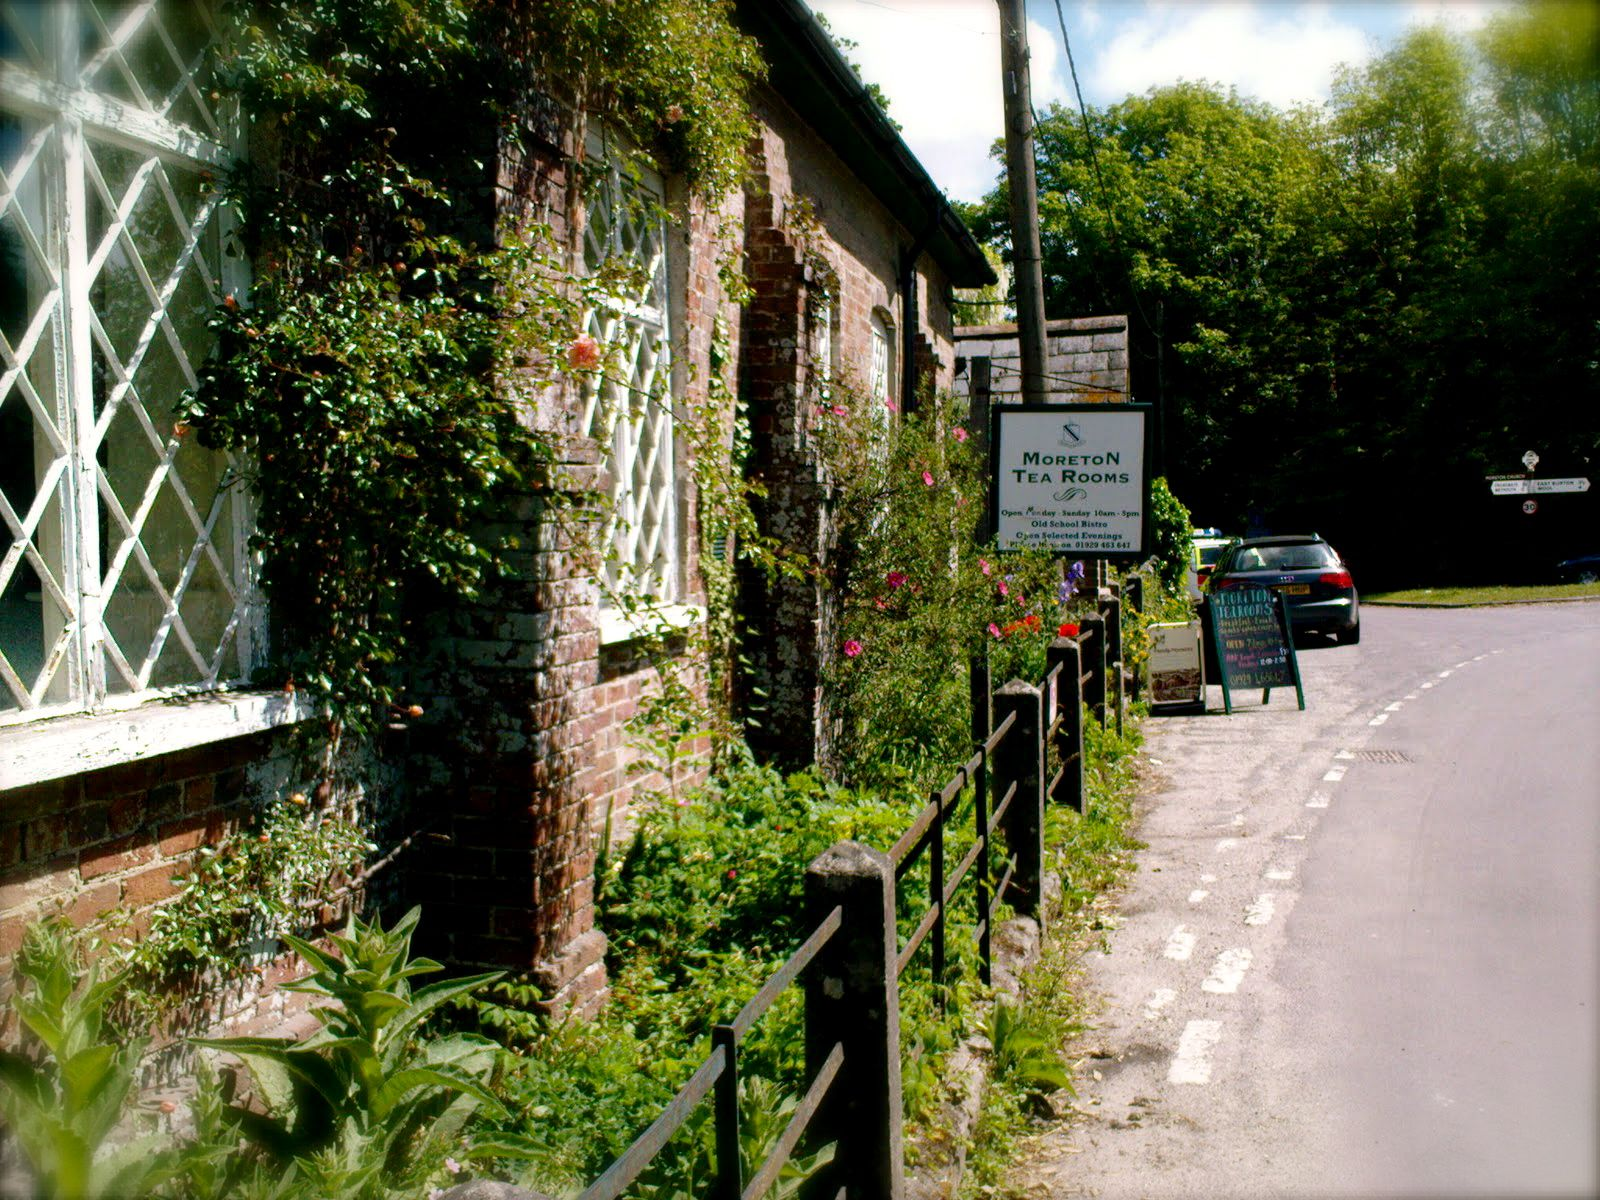 The Old School, Moreton Dorset DT2 8RH Tel 01929 463 647